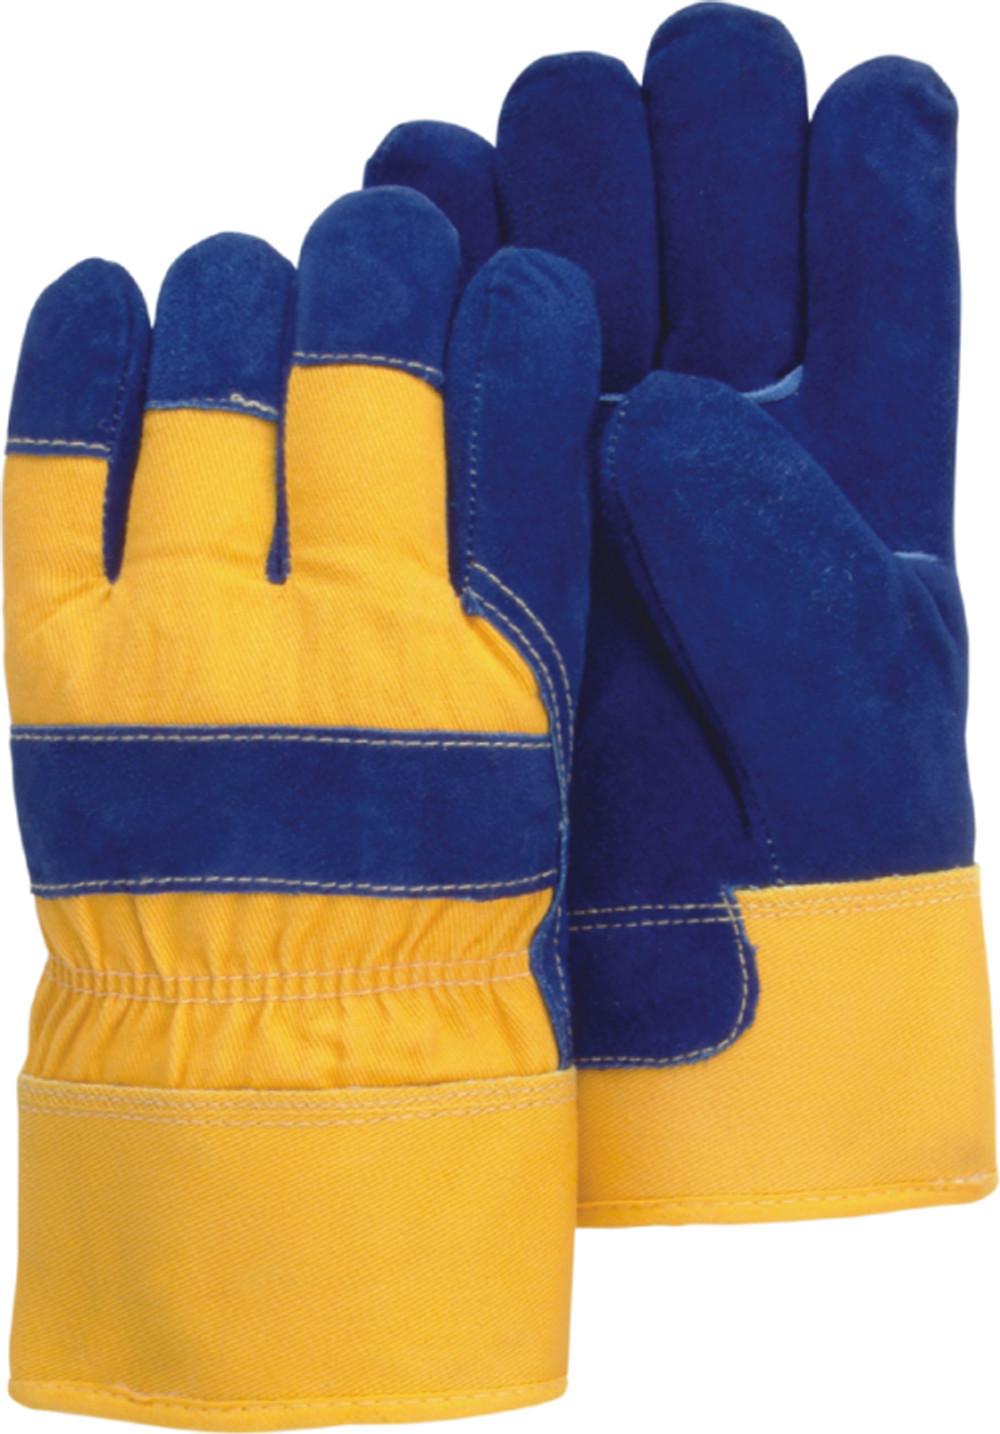 Leather work gloves drawstring -  Viz Ociates Por Leather Gloves Work